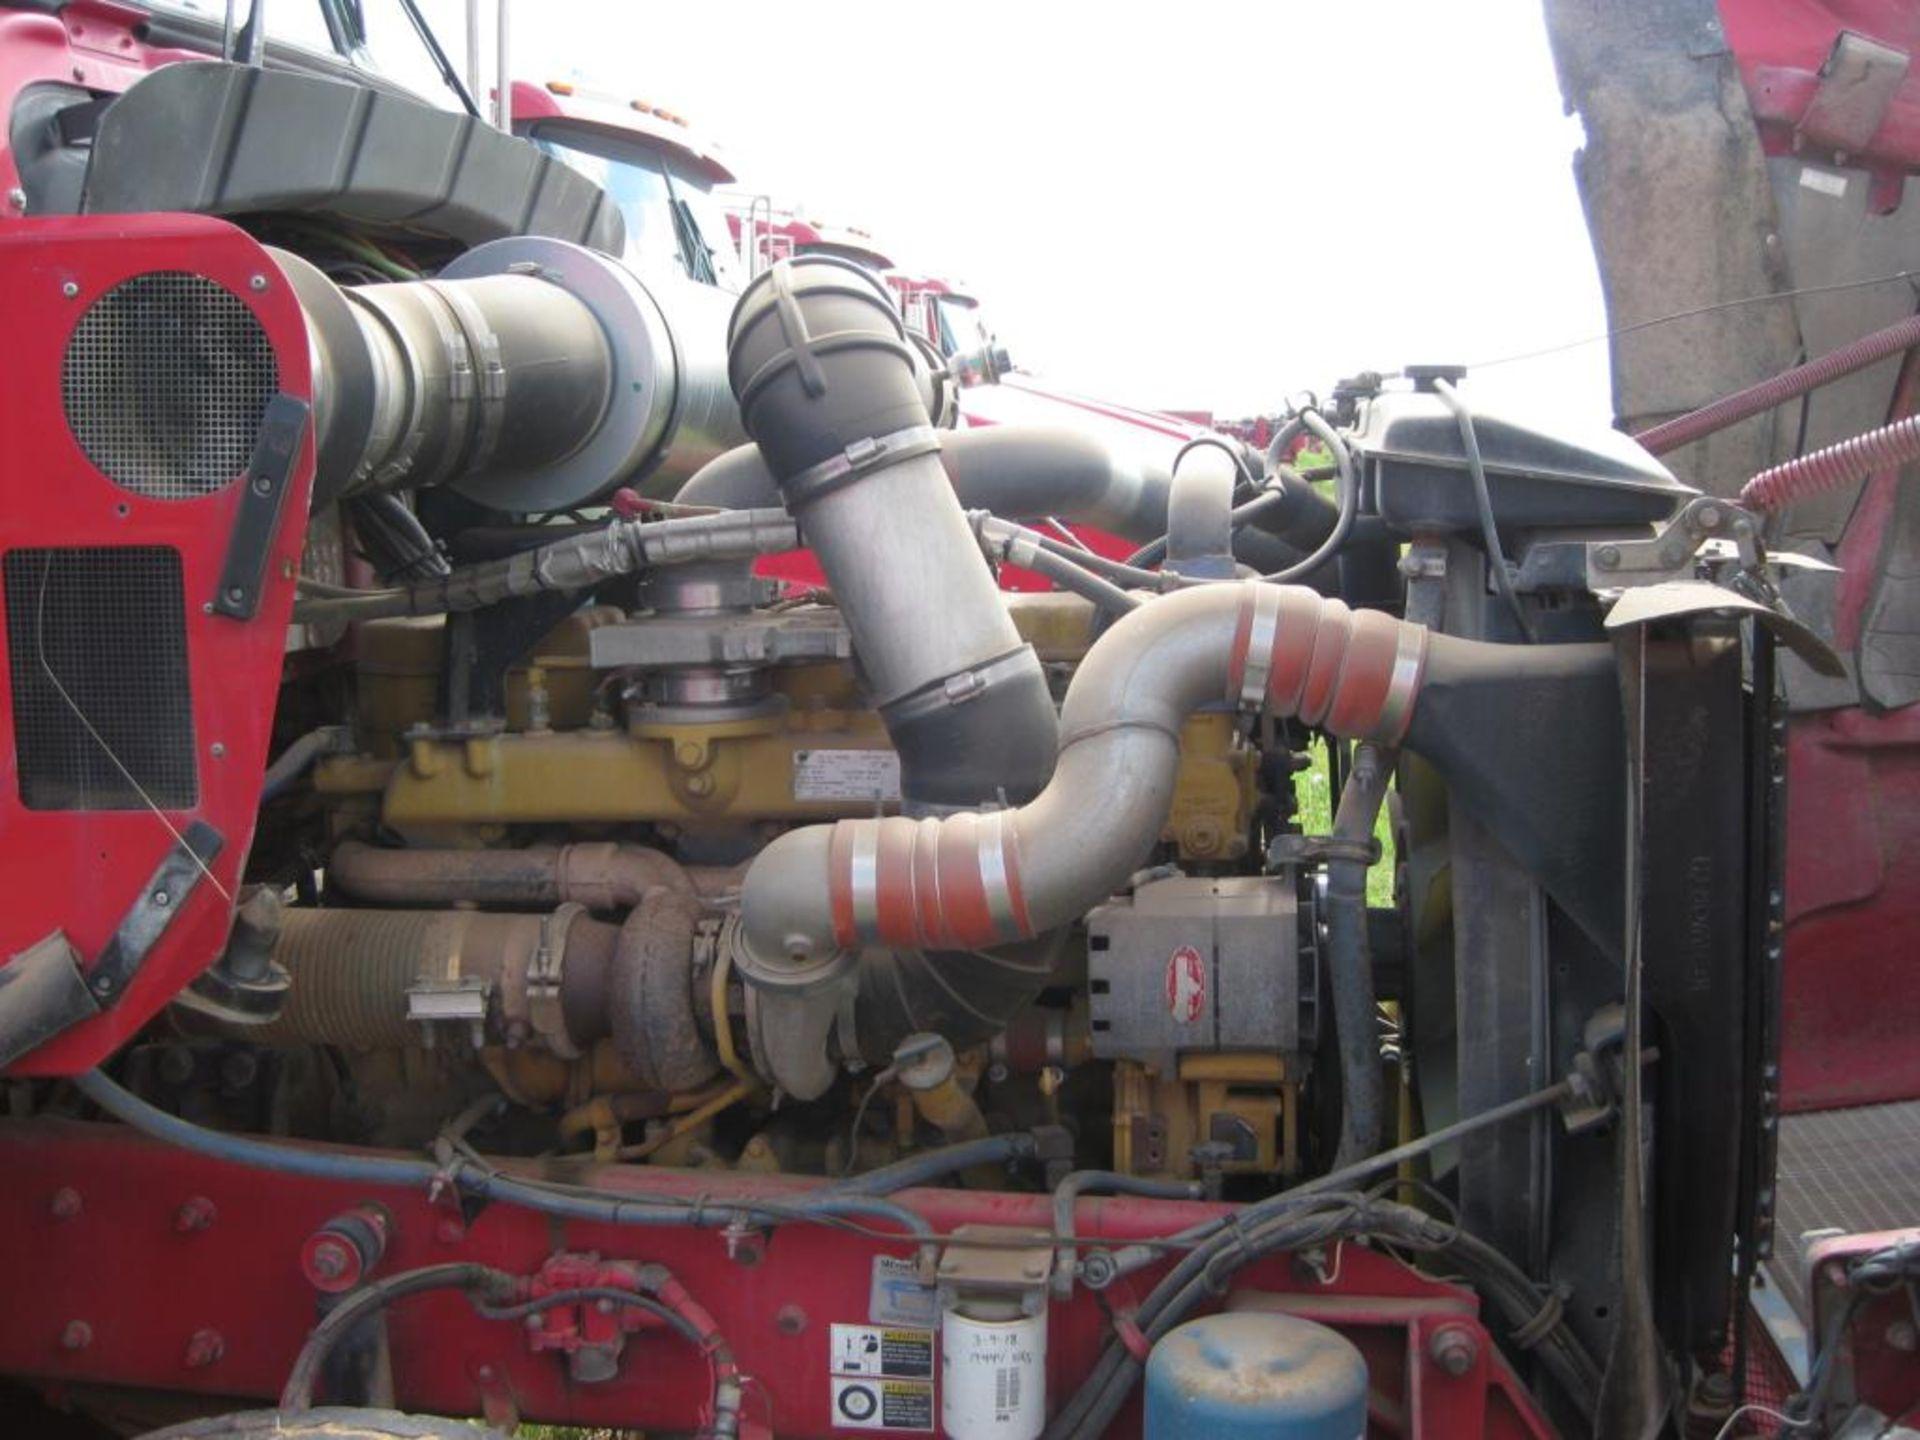 Kenworth Truck - Image 20 of 20